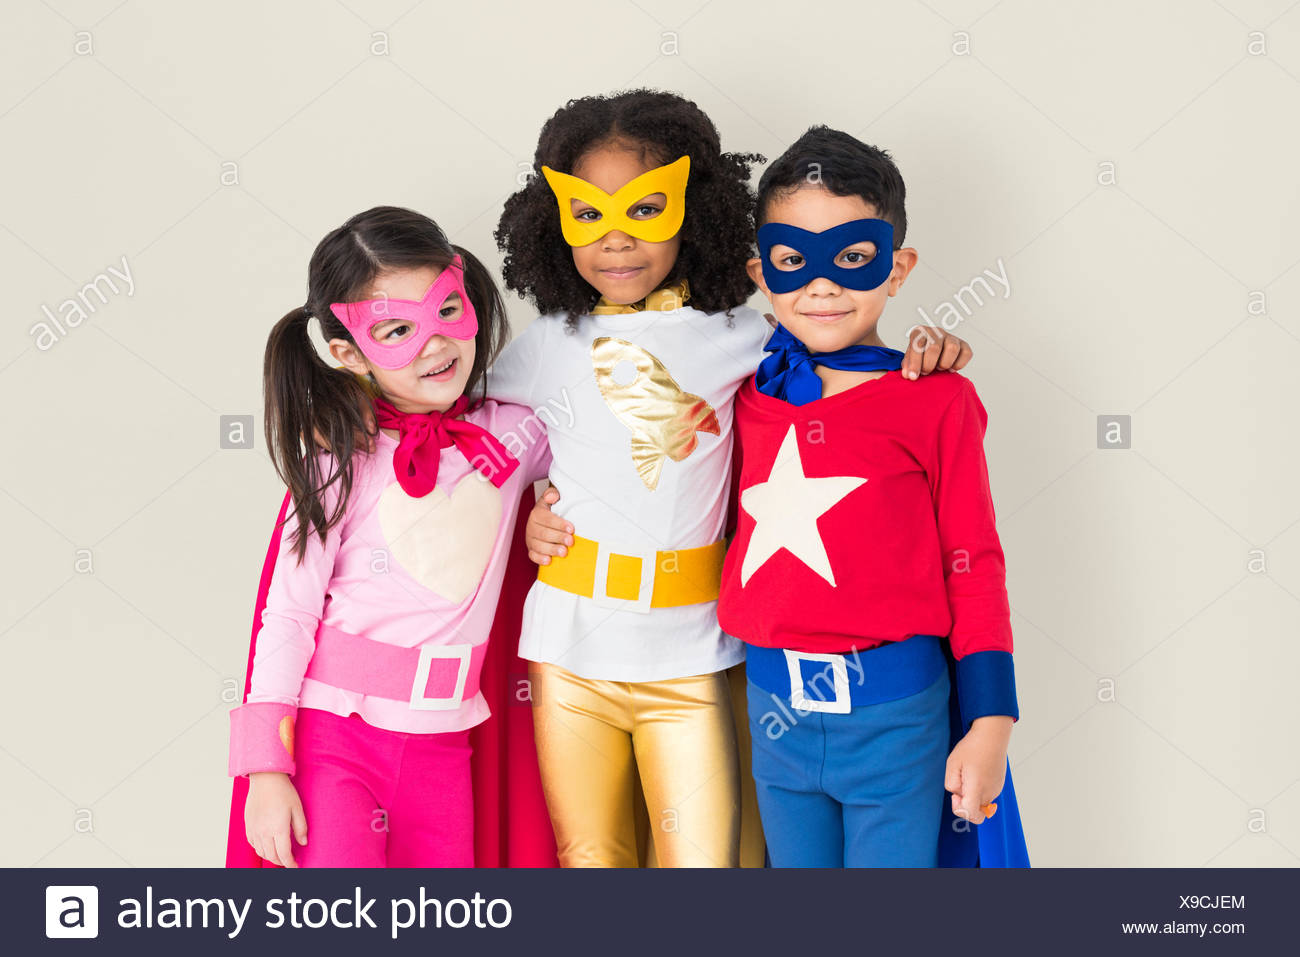 Superhero Adolescence Child Kid Expertise Concept - Stock Image